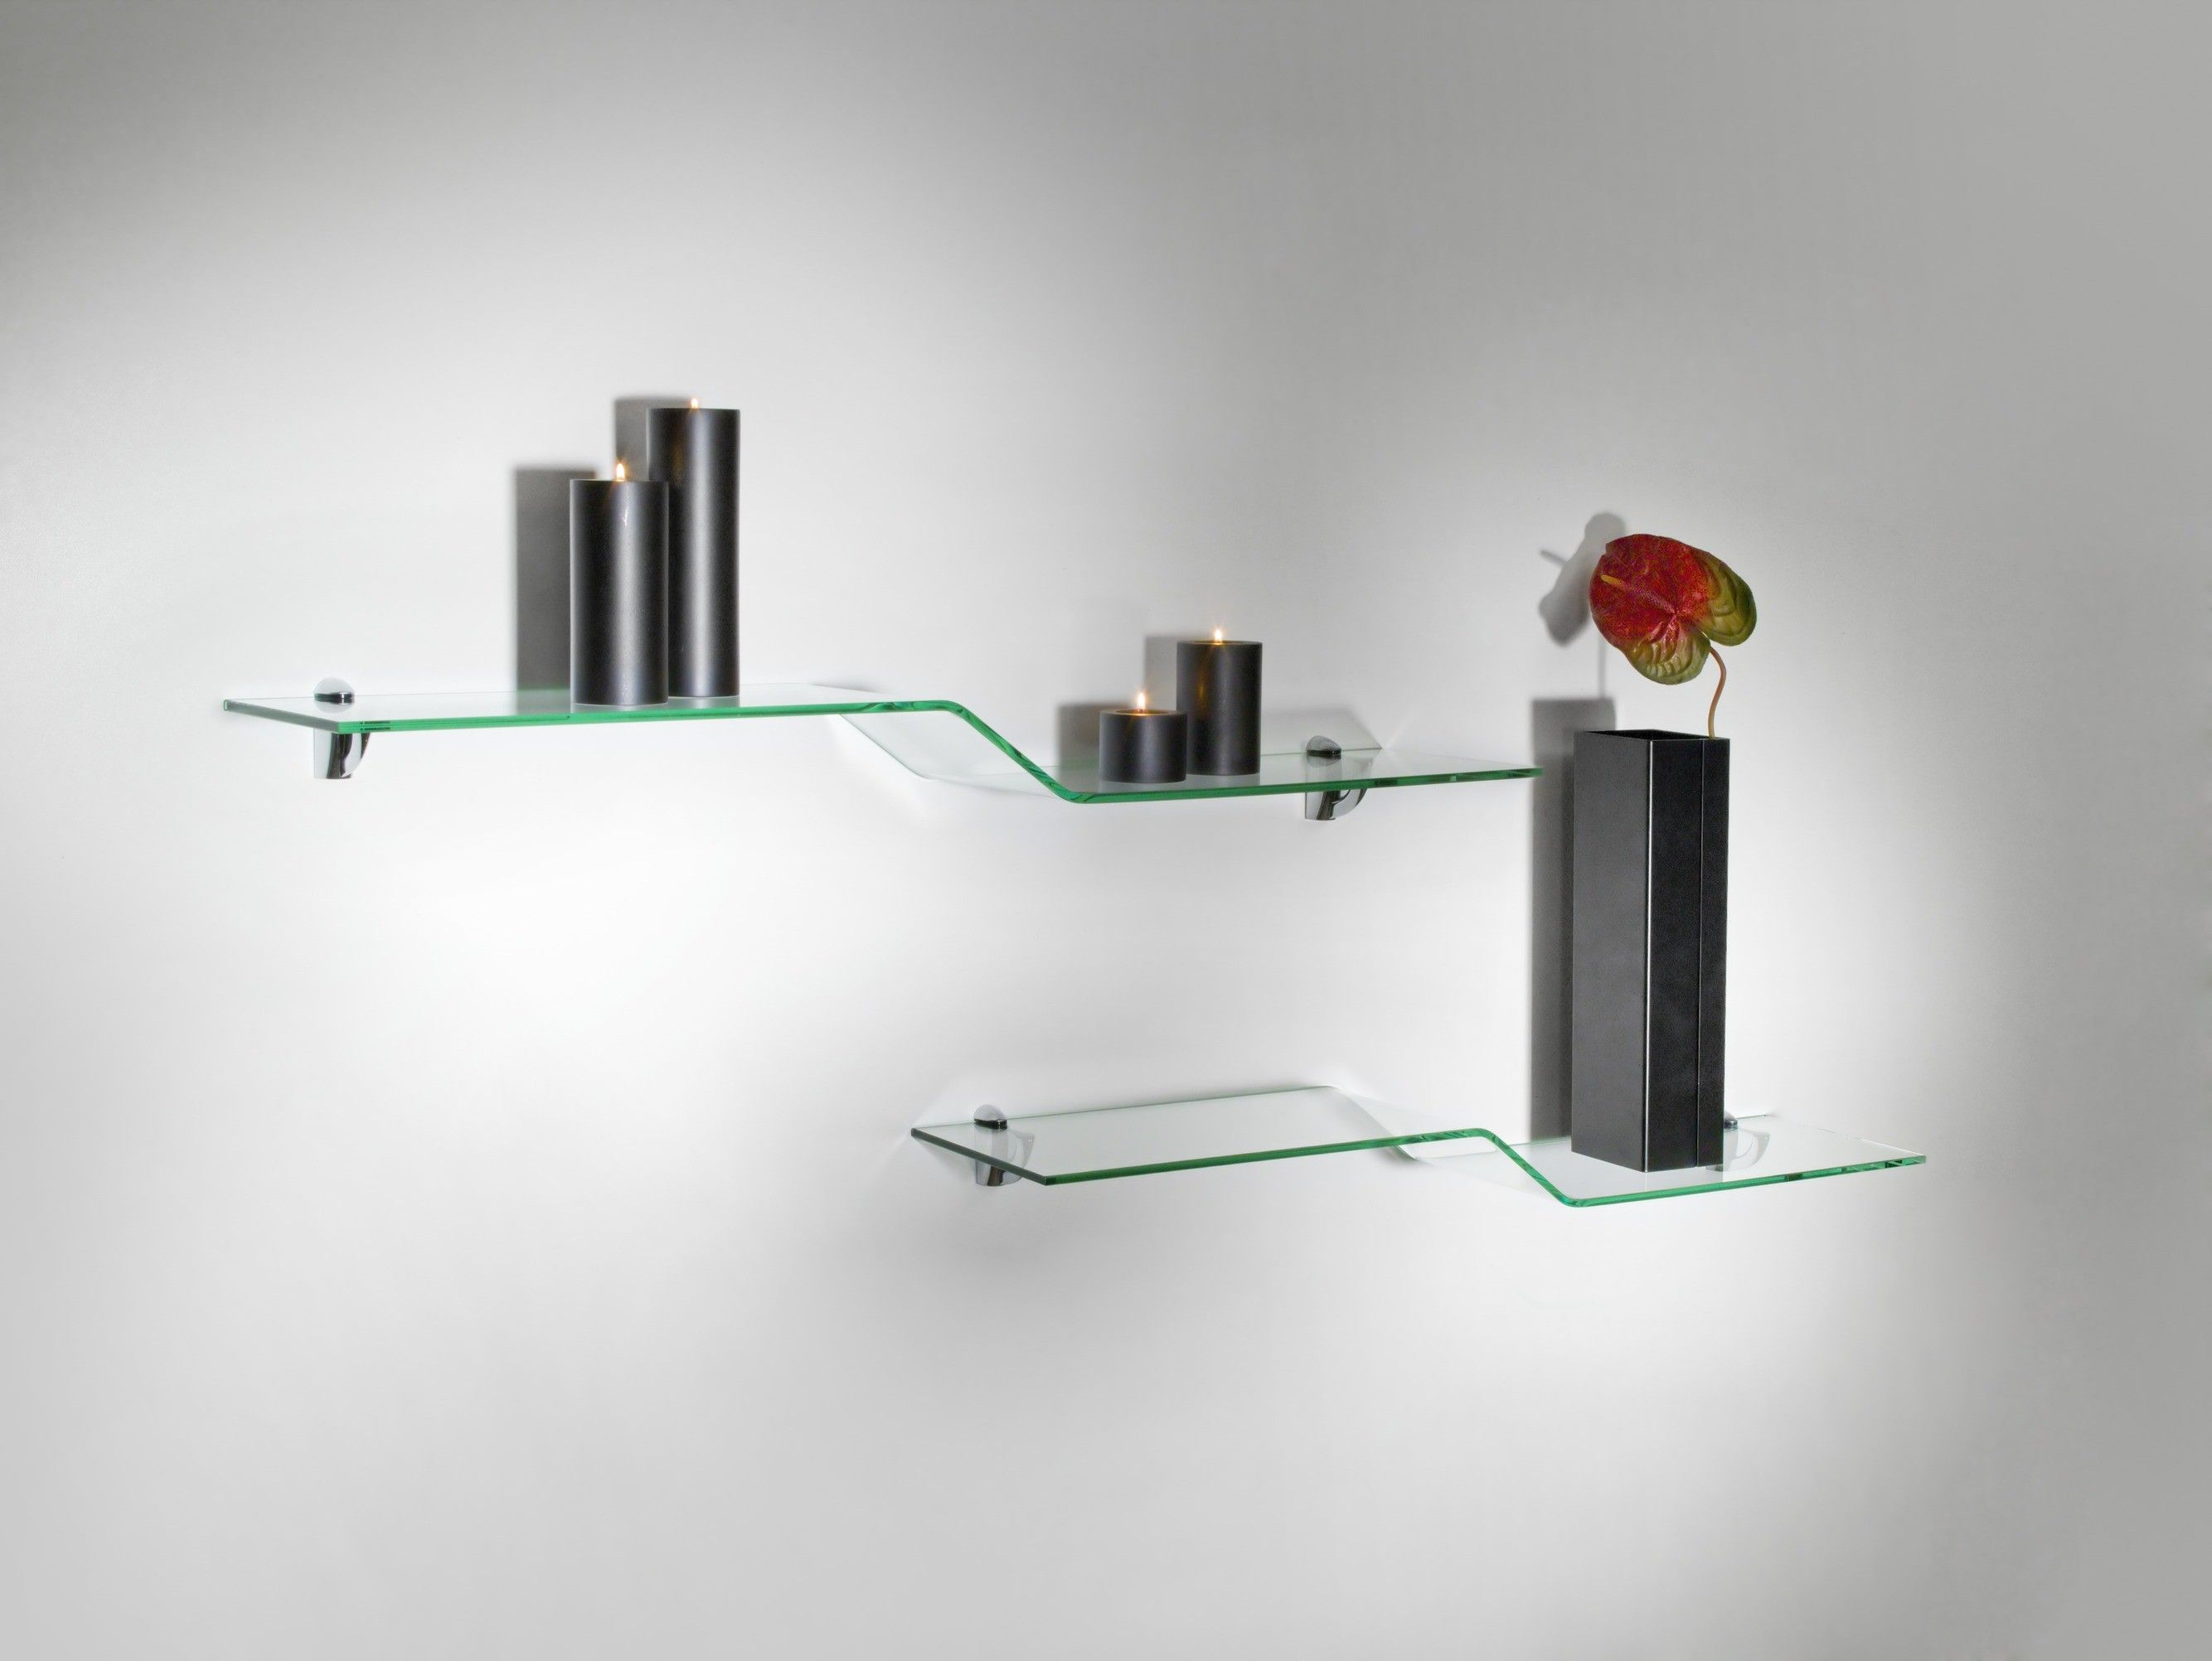 Mensole moderne in vetro design Boa | Mensole moderne | Pinterest